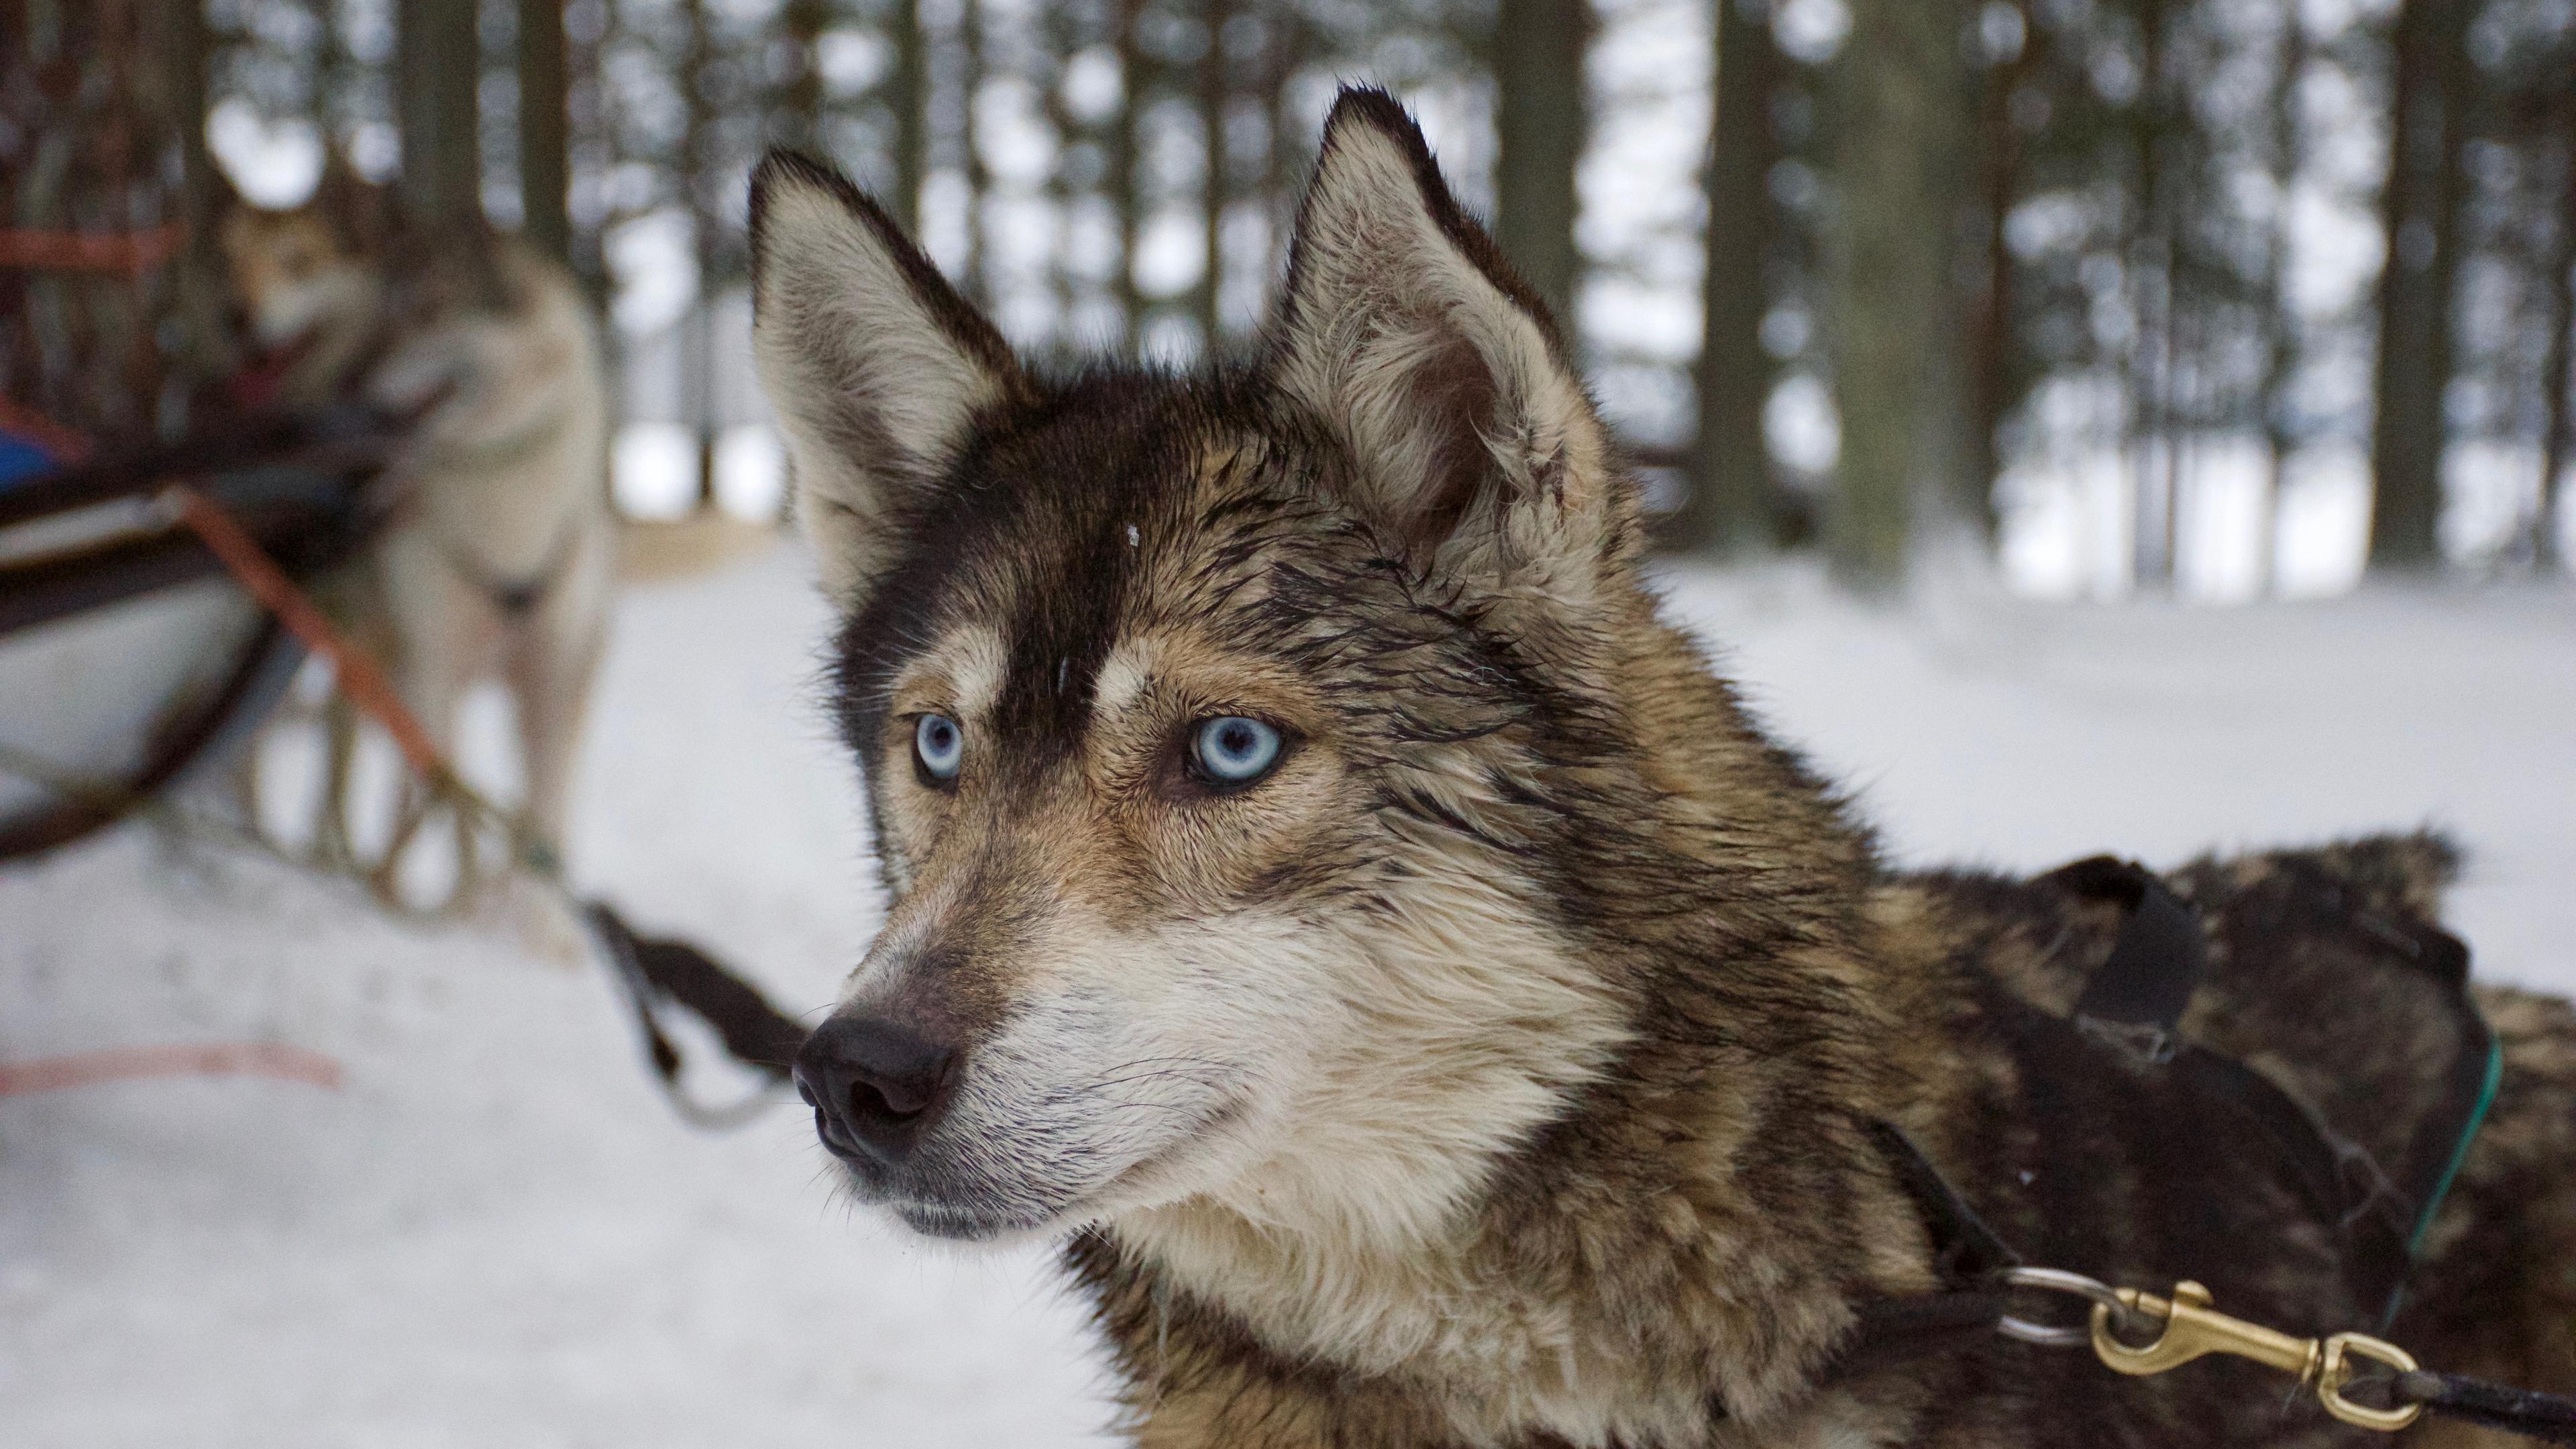 husky muzzle dog blue eyed 4k 1542241981 - husky, muzzle, dog, blue-eyed 4k - muzzle, husky, Dog